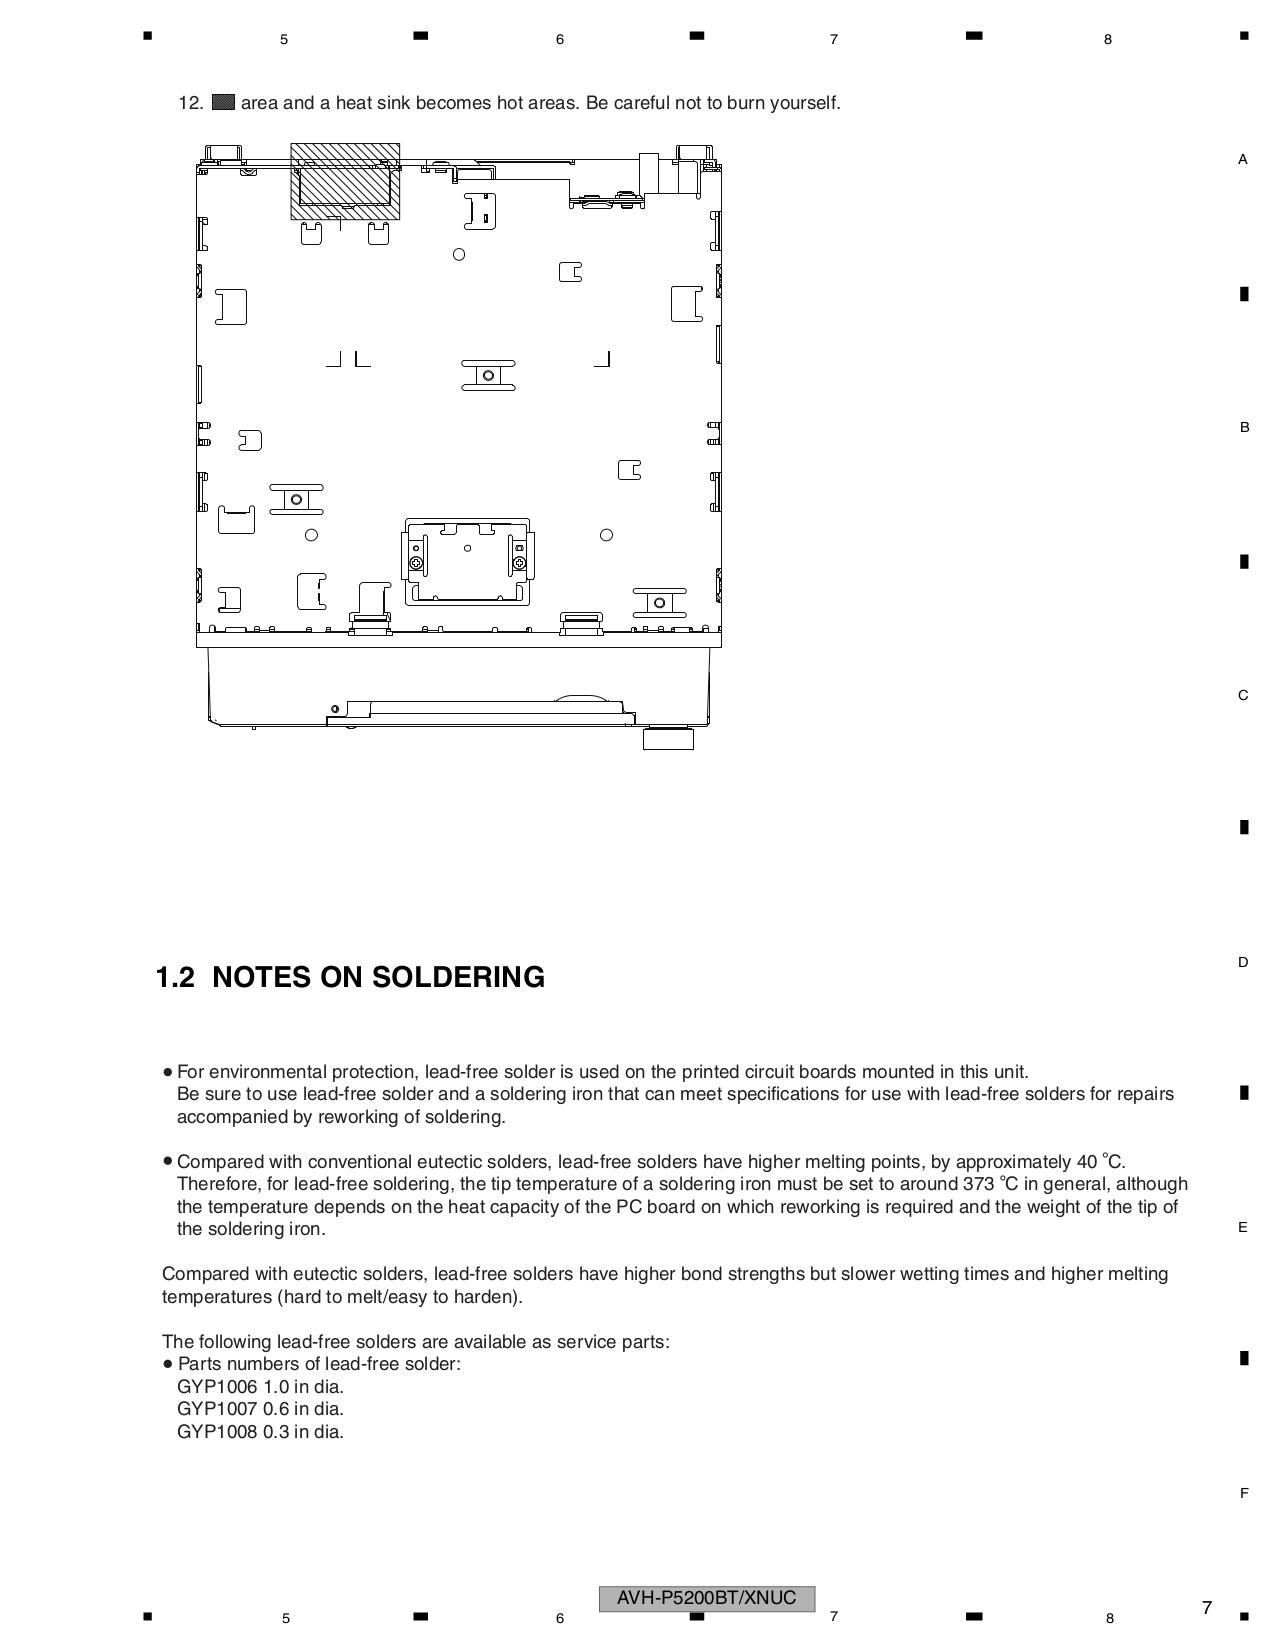 Pdf Manual For Pioneer Car Video Avhp5200dvd. Pioneer Car Video Avhp5200dvd Pdf Page Preview. Wiring. Wiring Diagram Pioneer Avh 5200 Video At Scoala.co